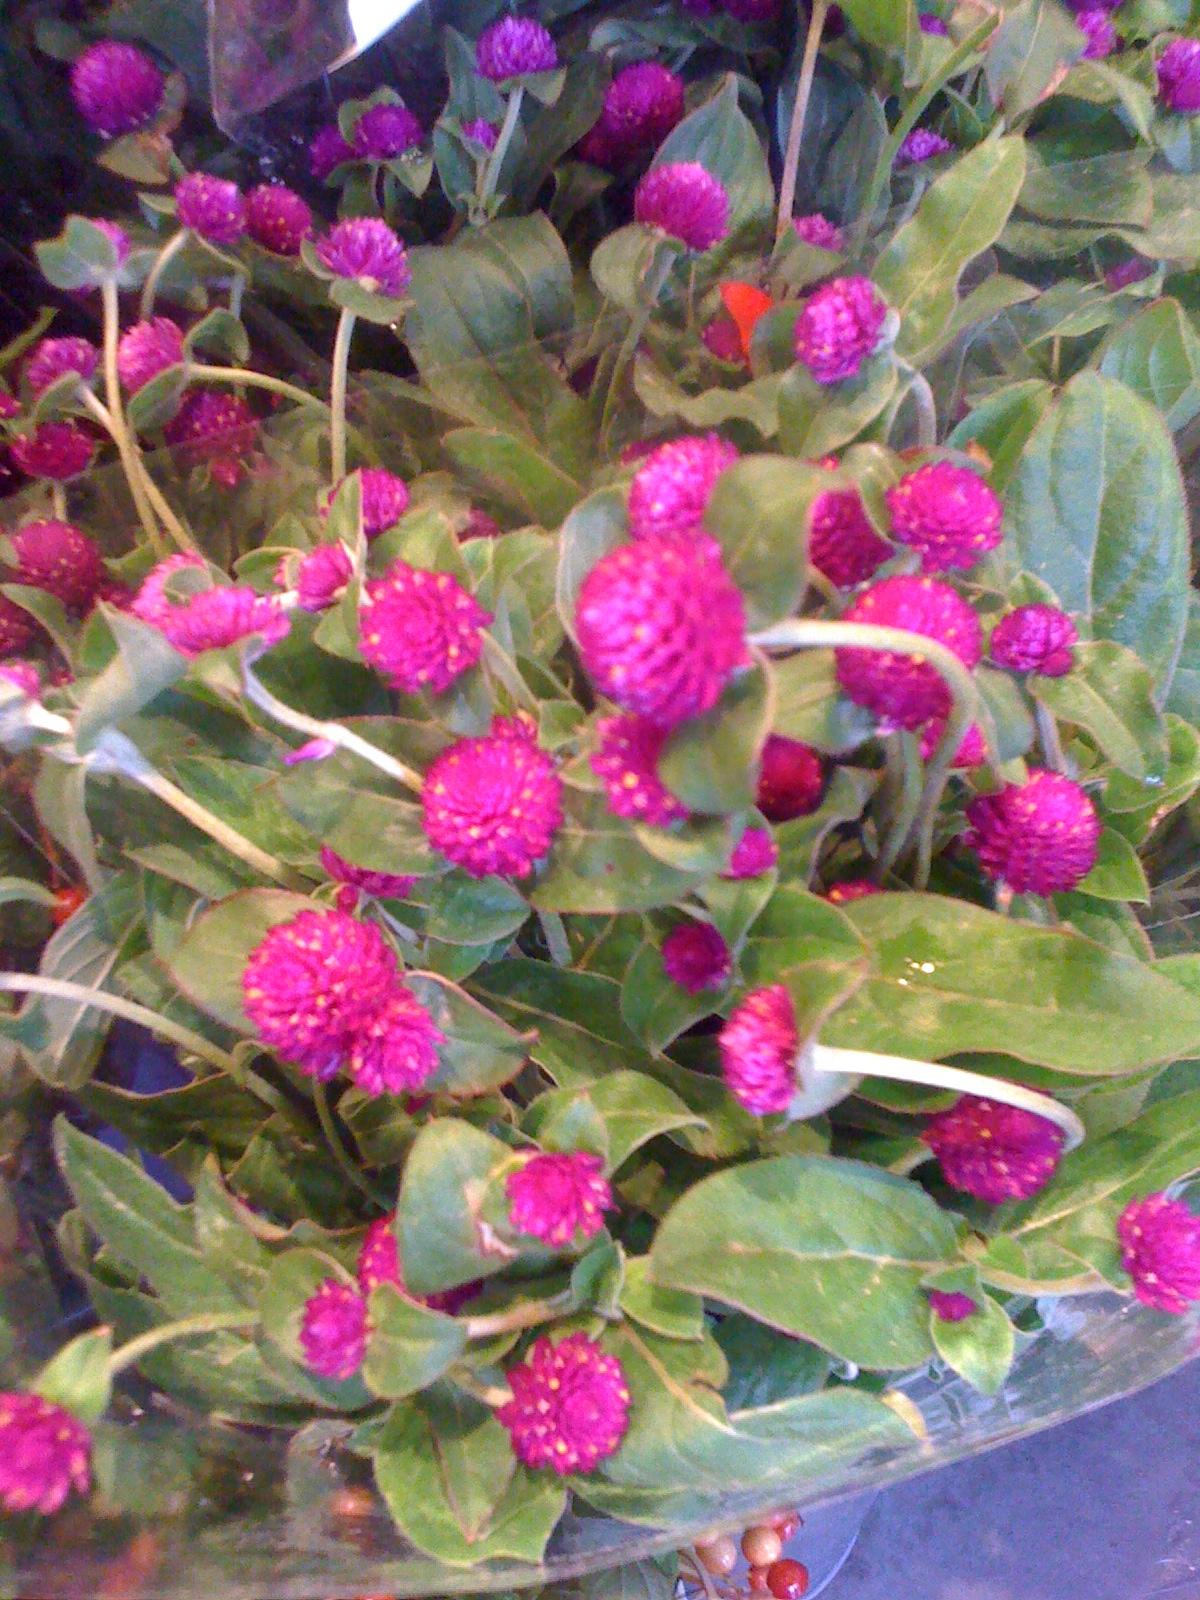 Flowers in season brooklyn brownstone for Flowers that are in season